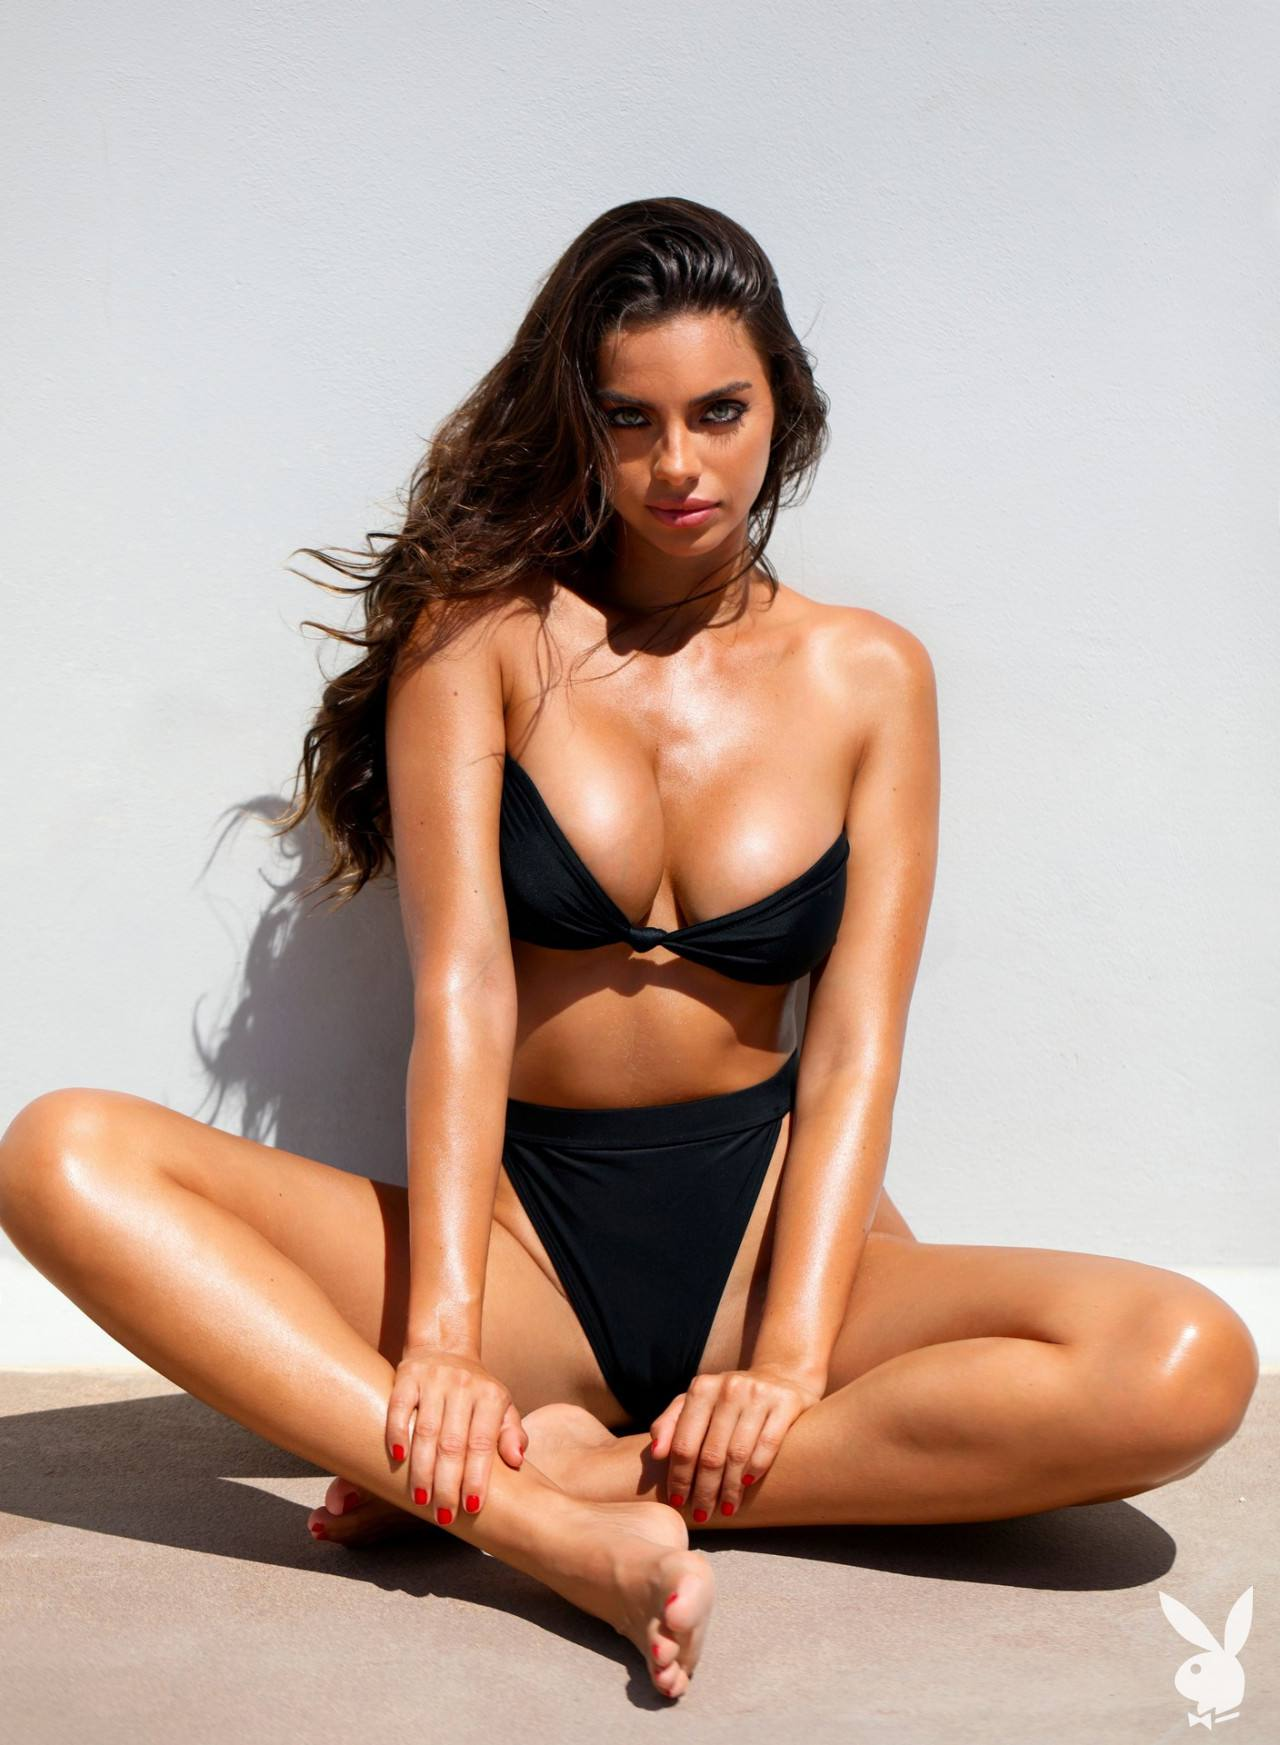 Priscilla Huggings Topless Playboy Photos